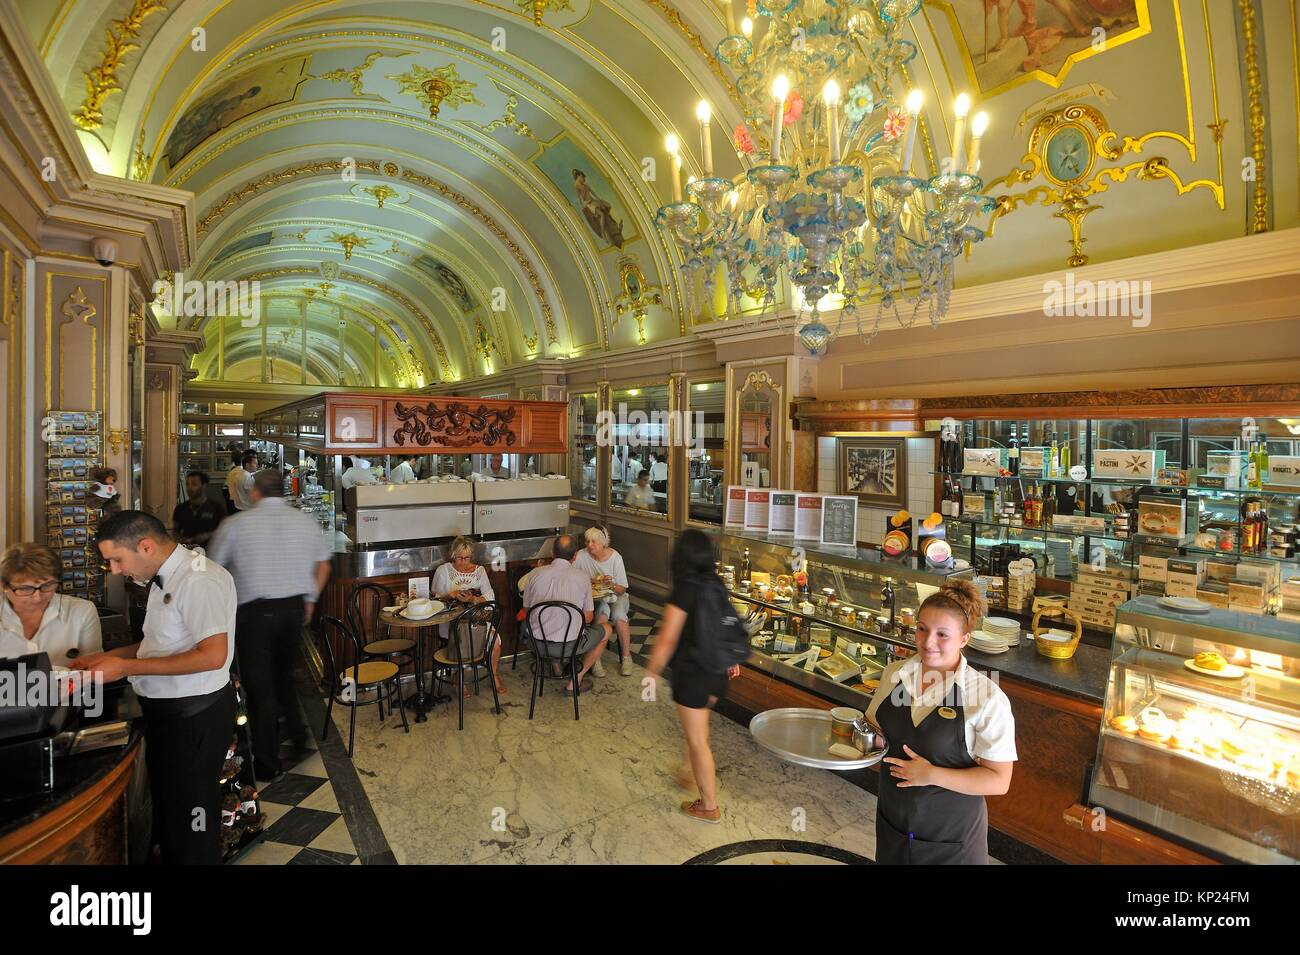 Caffe Cordina, famous cafe restaurant and cake shop, 244 Republic Street, Valletta, Malta, Southern Europe. - Stock Image